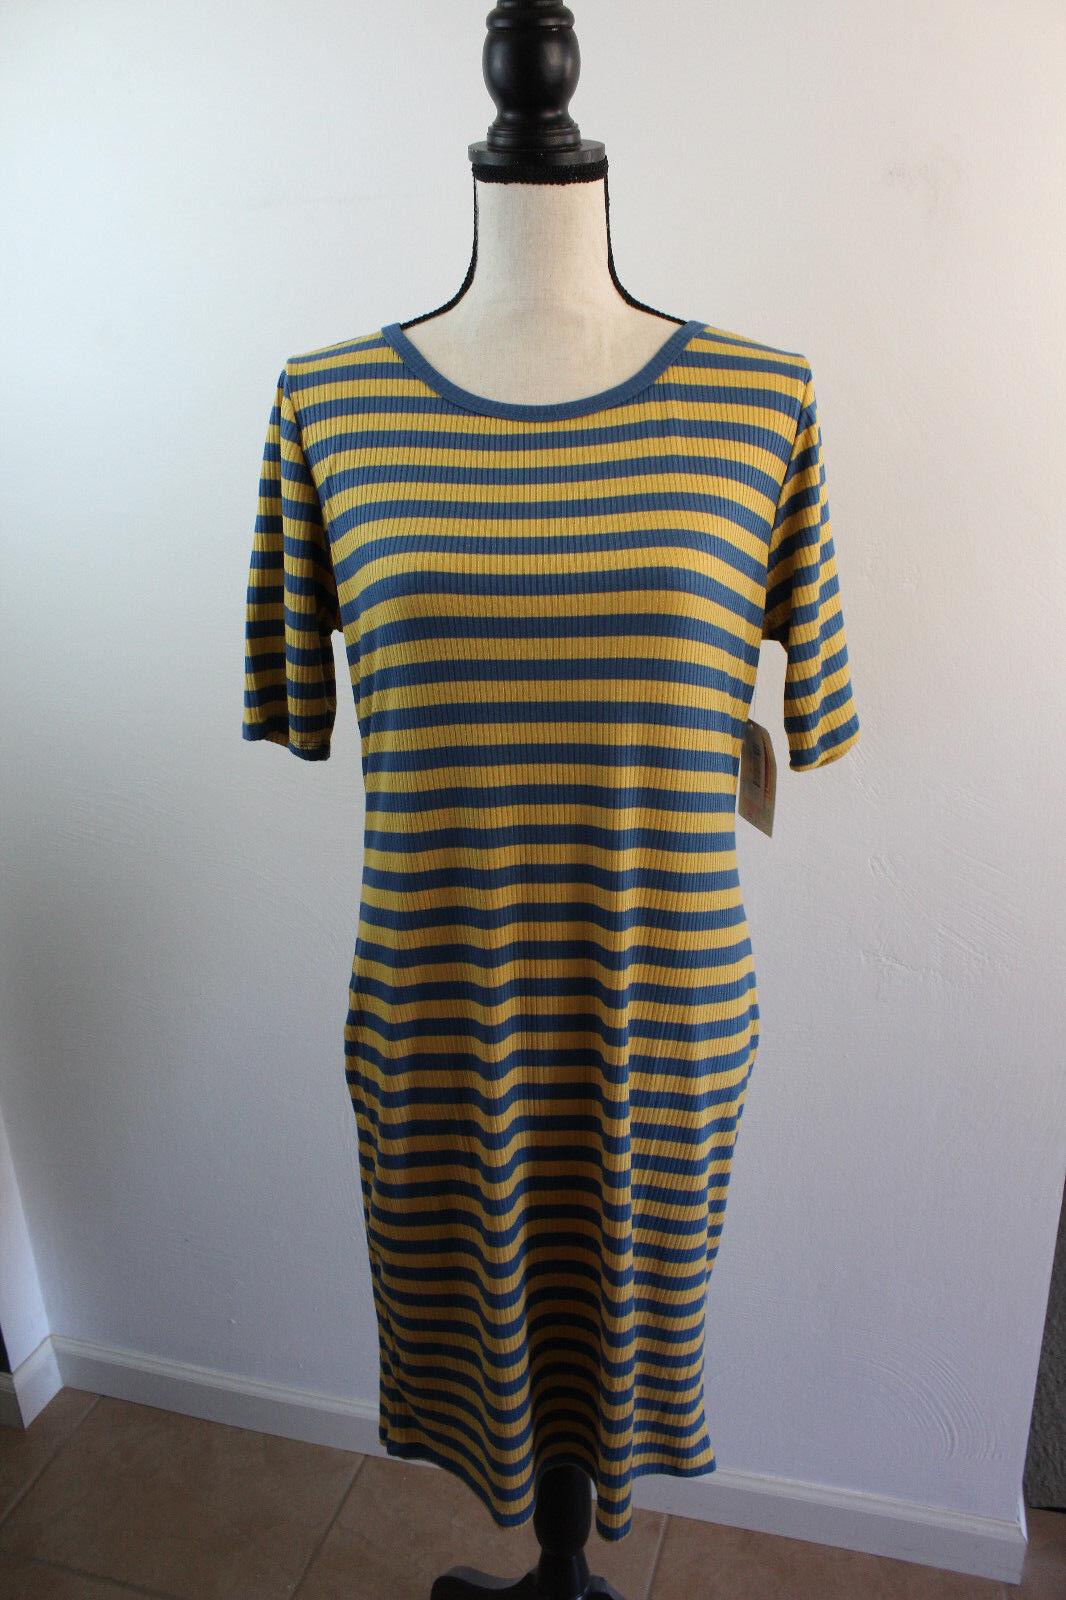 NWT Women's Lularoe Julia Dress Striped bluee gold Dress Sz Medium Lularoe Dress